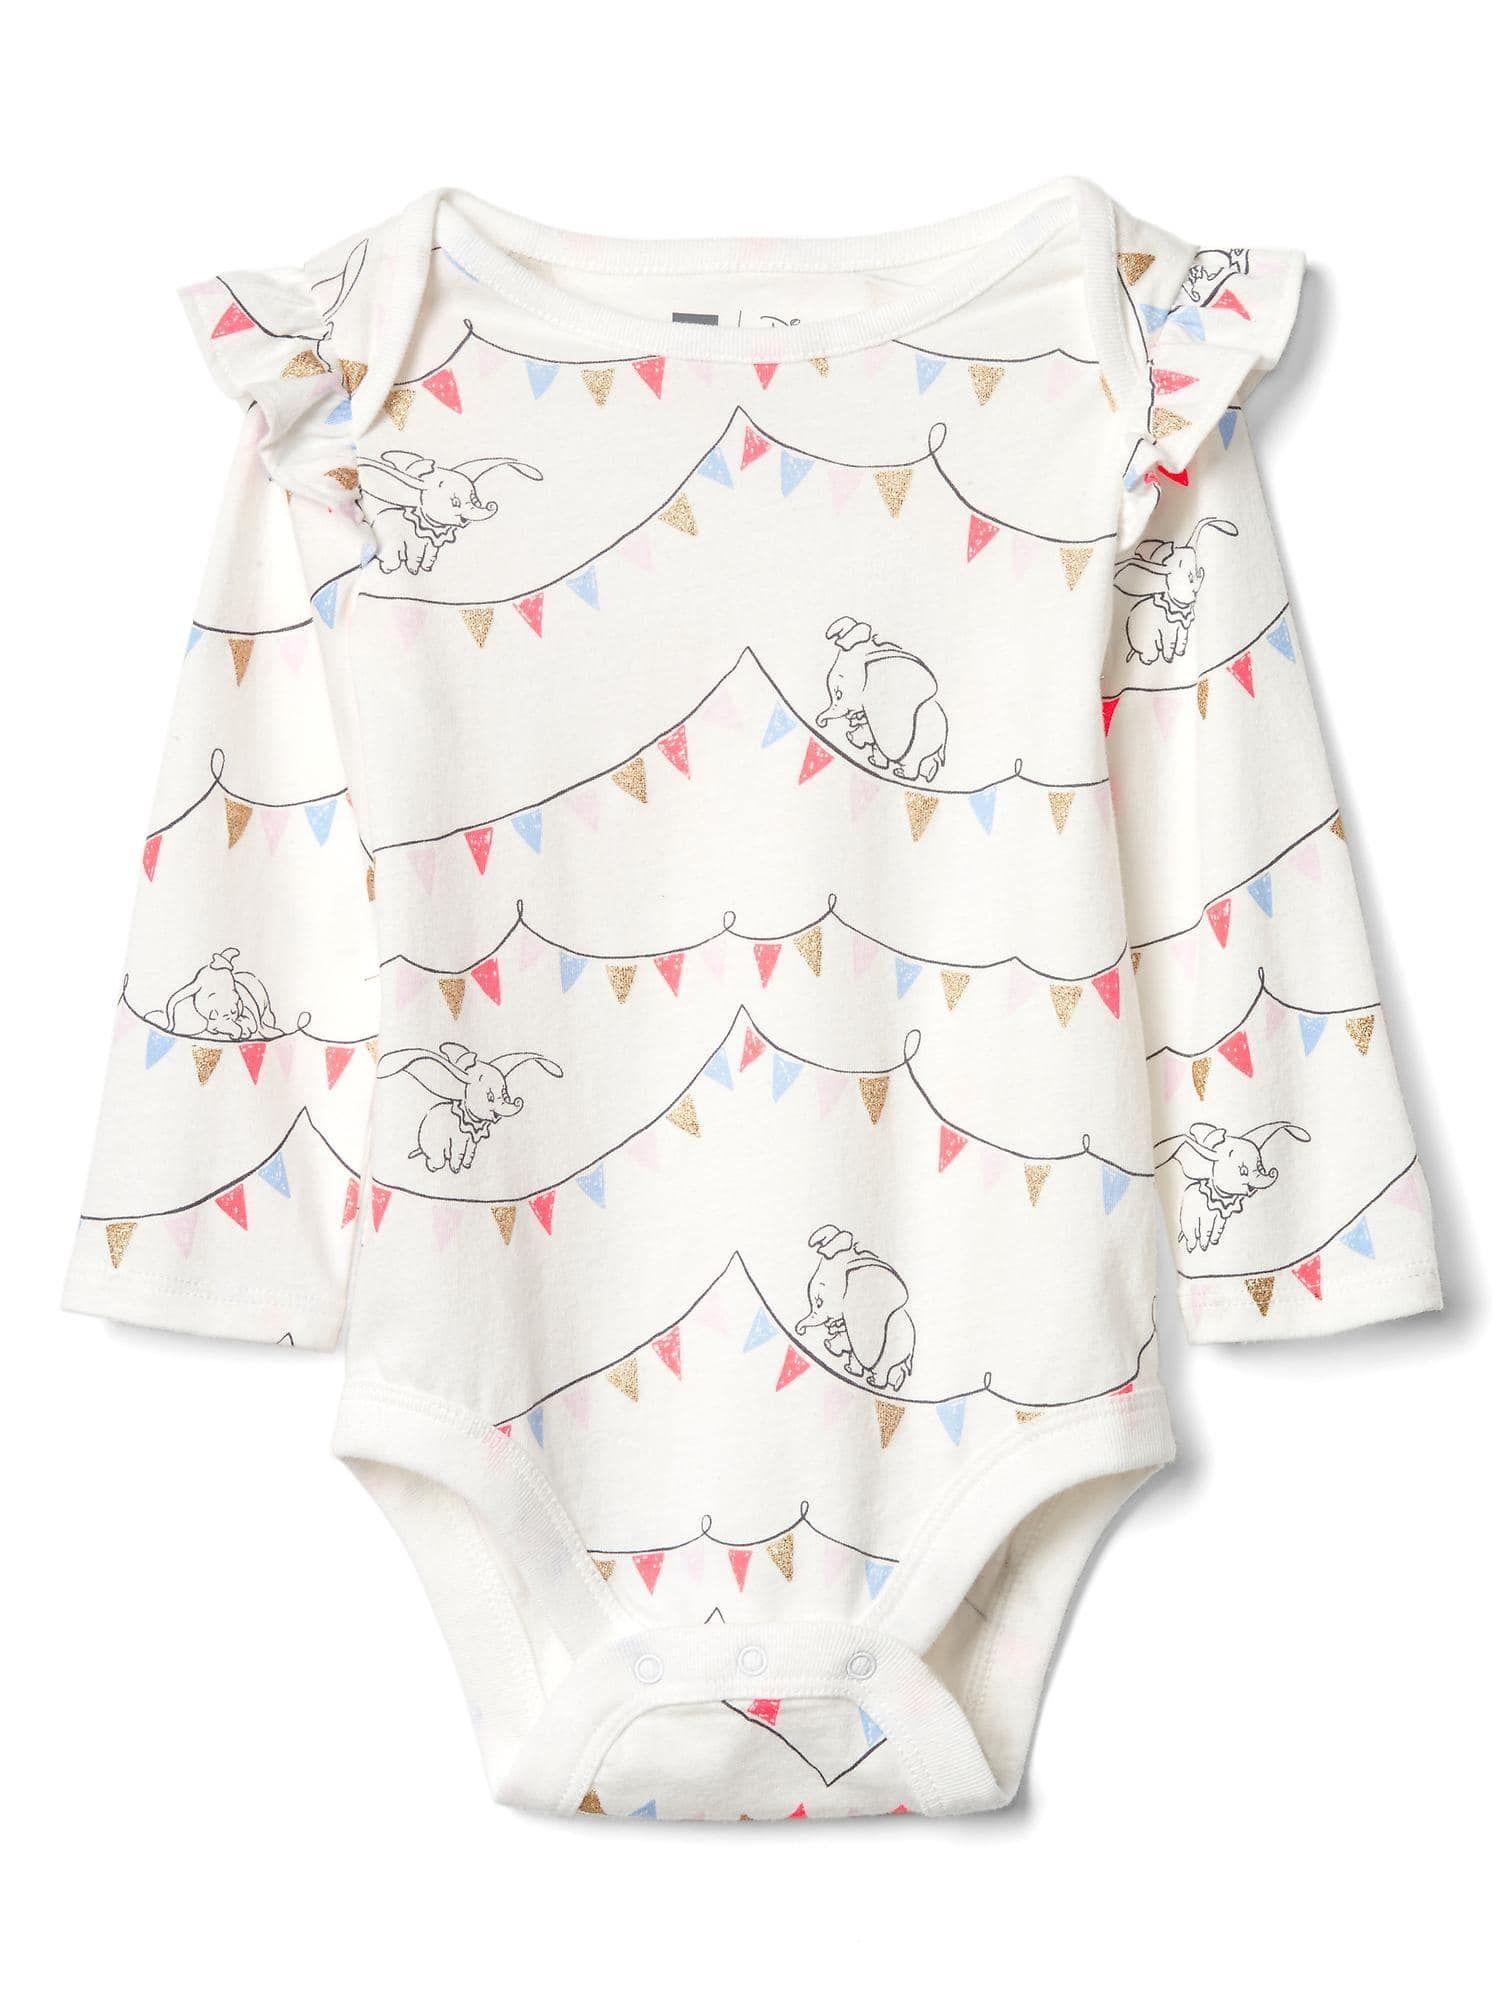 ea9acfa69 Dumbo Flag Print | Gap Baby | Portfolio | Disney baby clothes girl ...